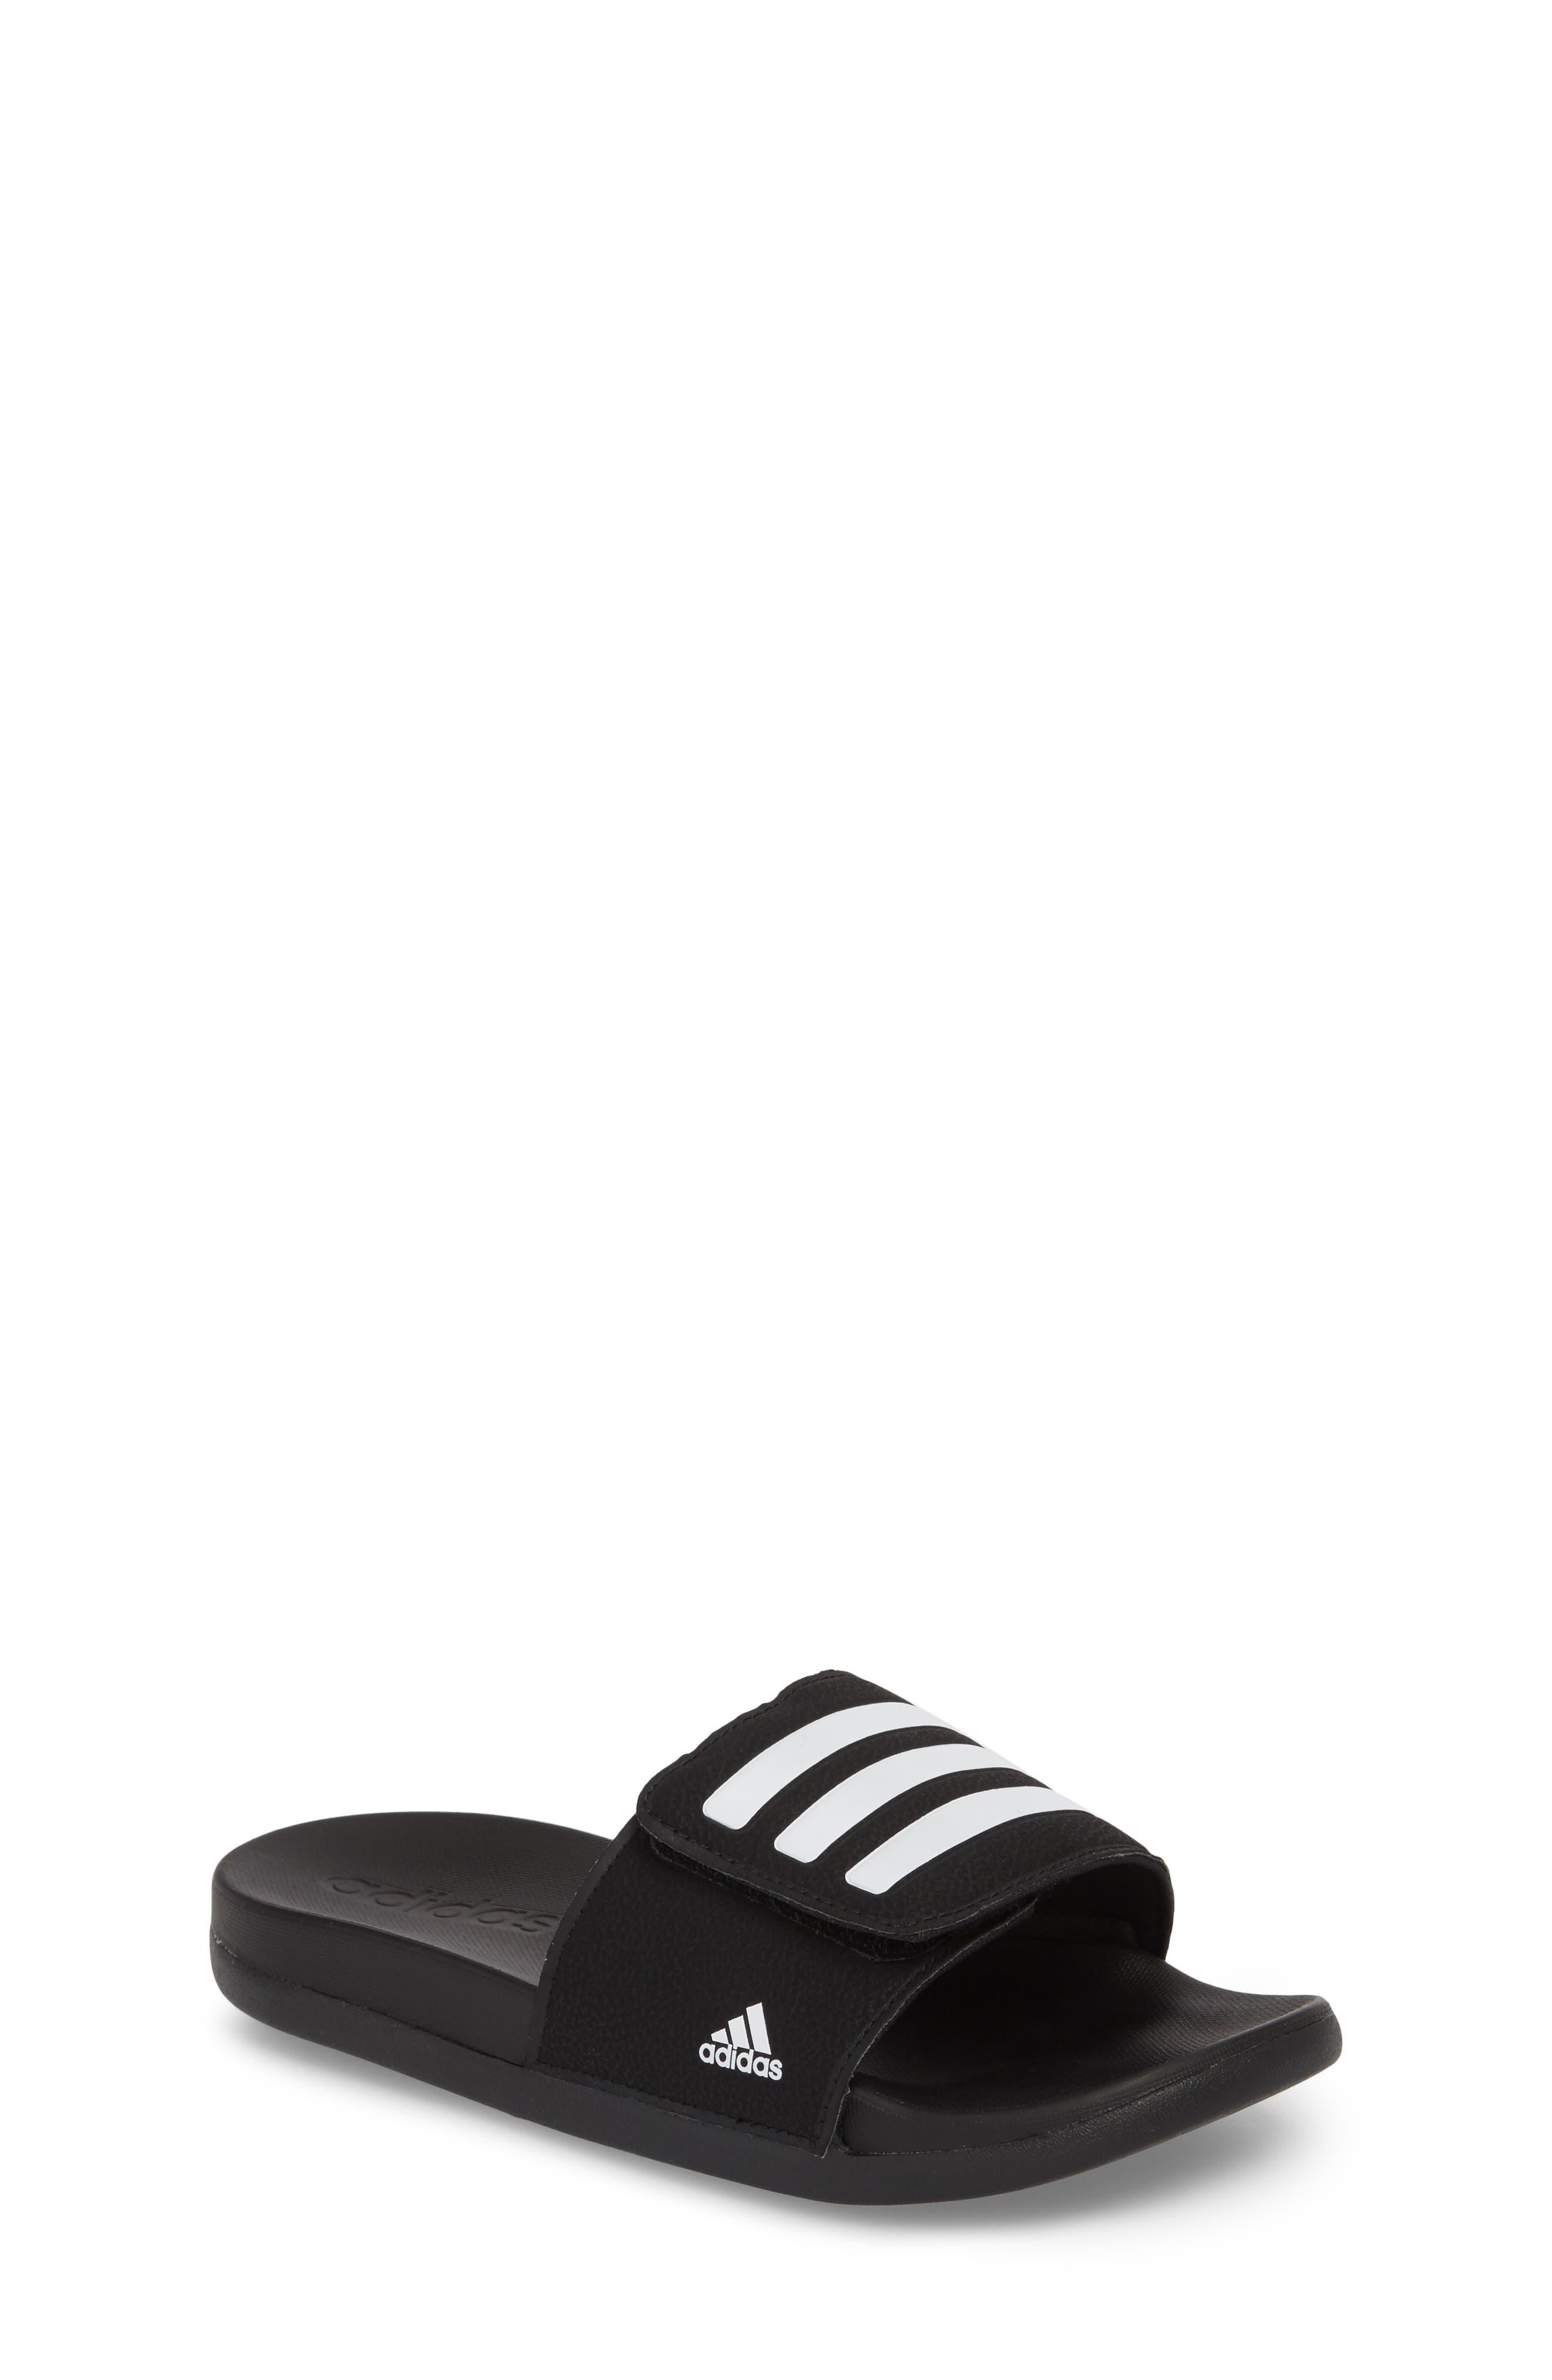 Adilette Slide Sandal,                             Main thumbnail 1, color,                             BLACK/ WHITE